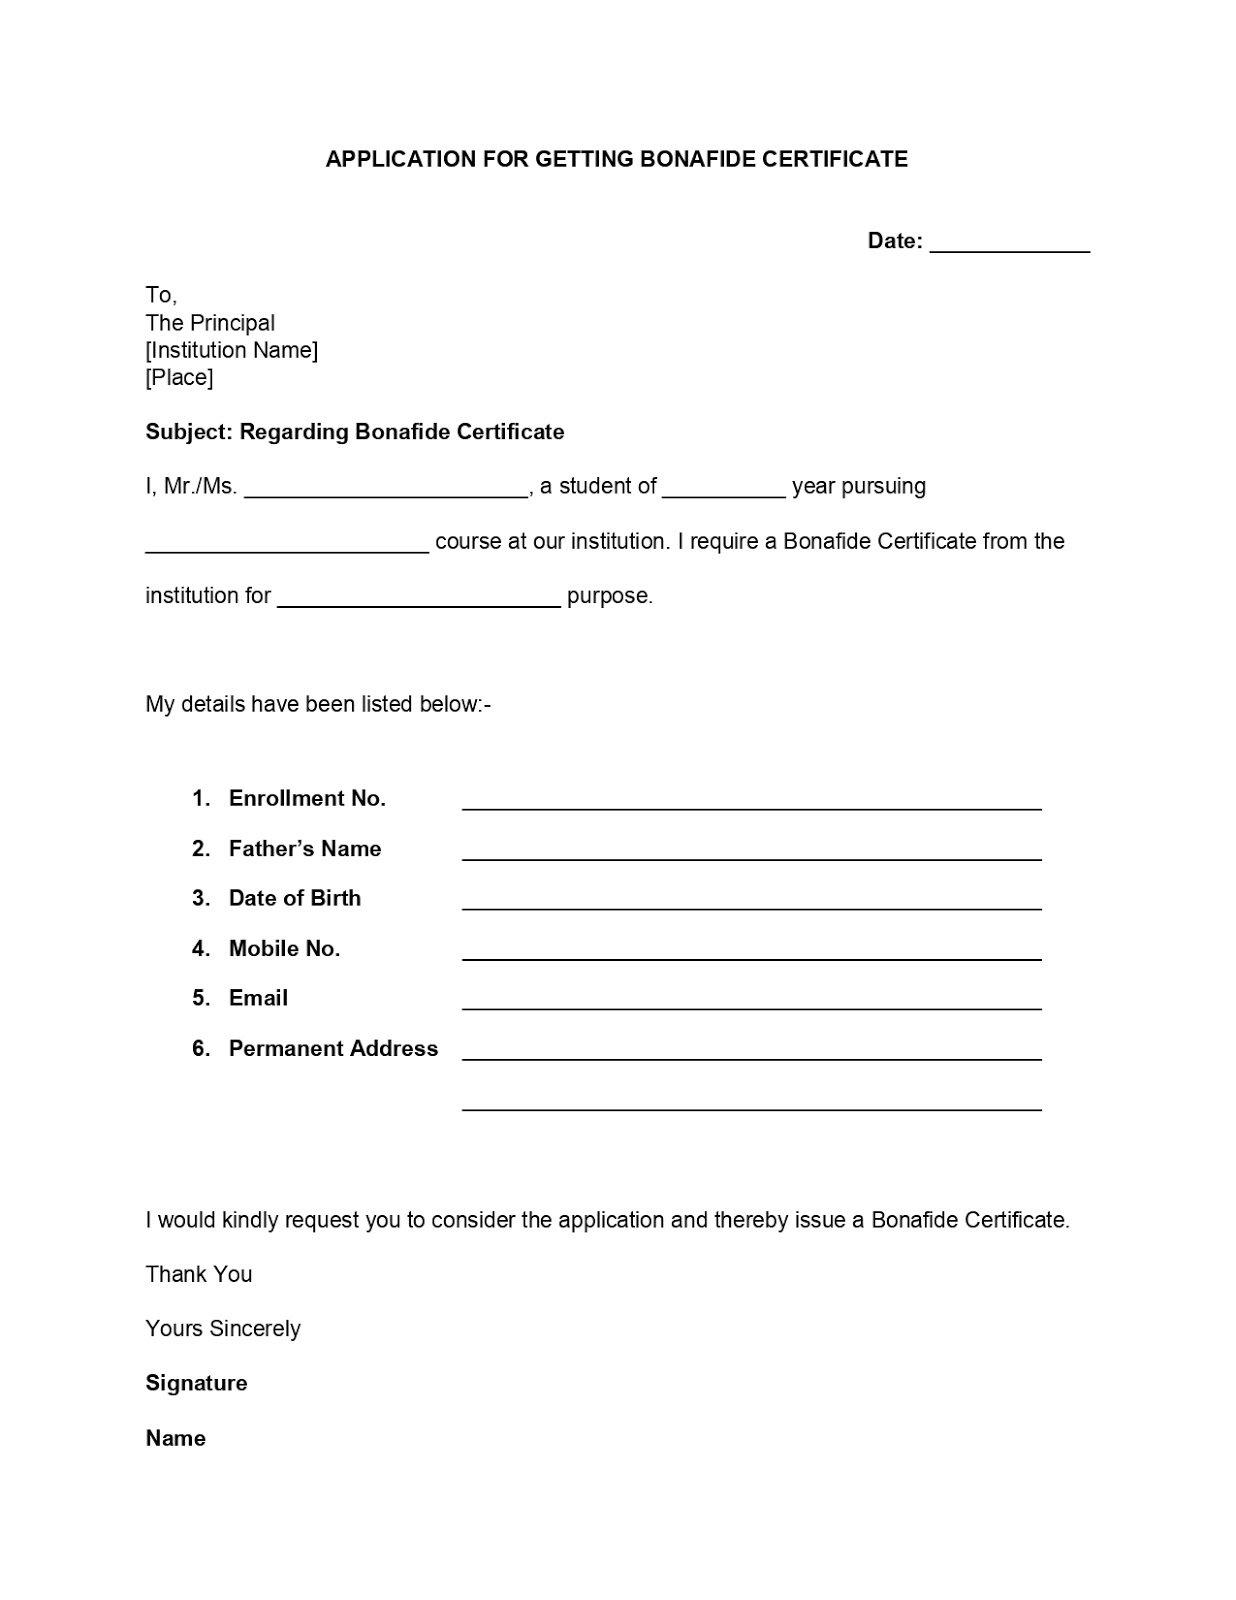 Bonafide Certificate Application